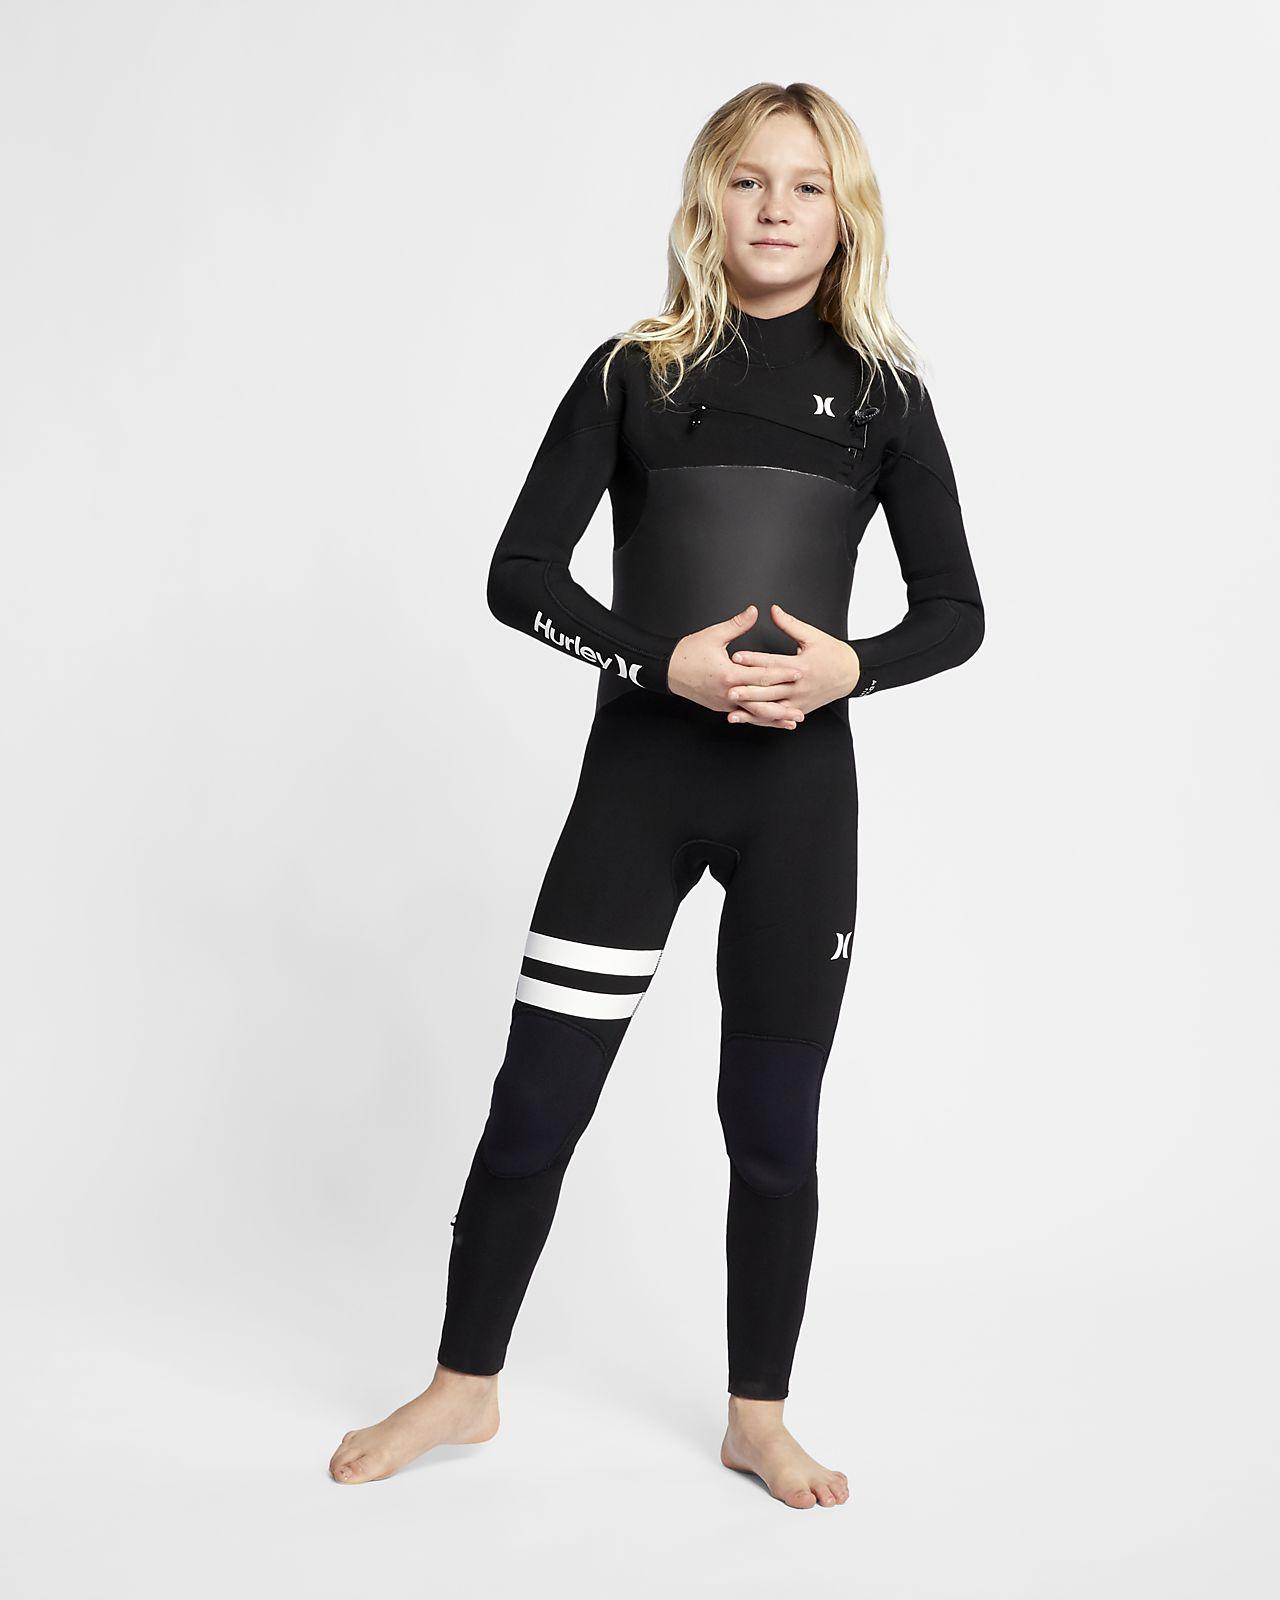 Traje de neopreno para niños talla grande Hurley Advantage Plus 5/3mm Fullsuit